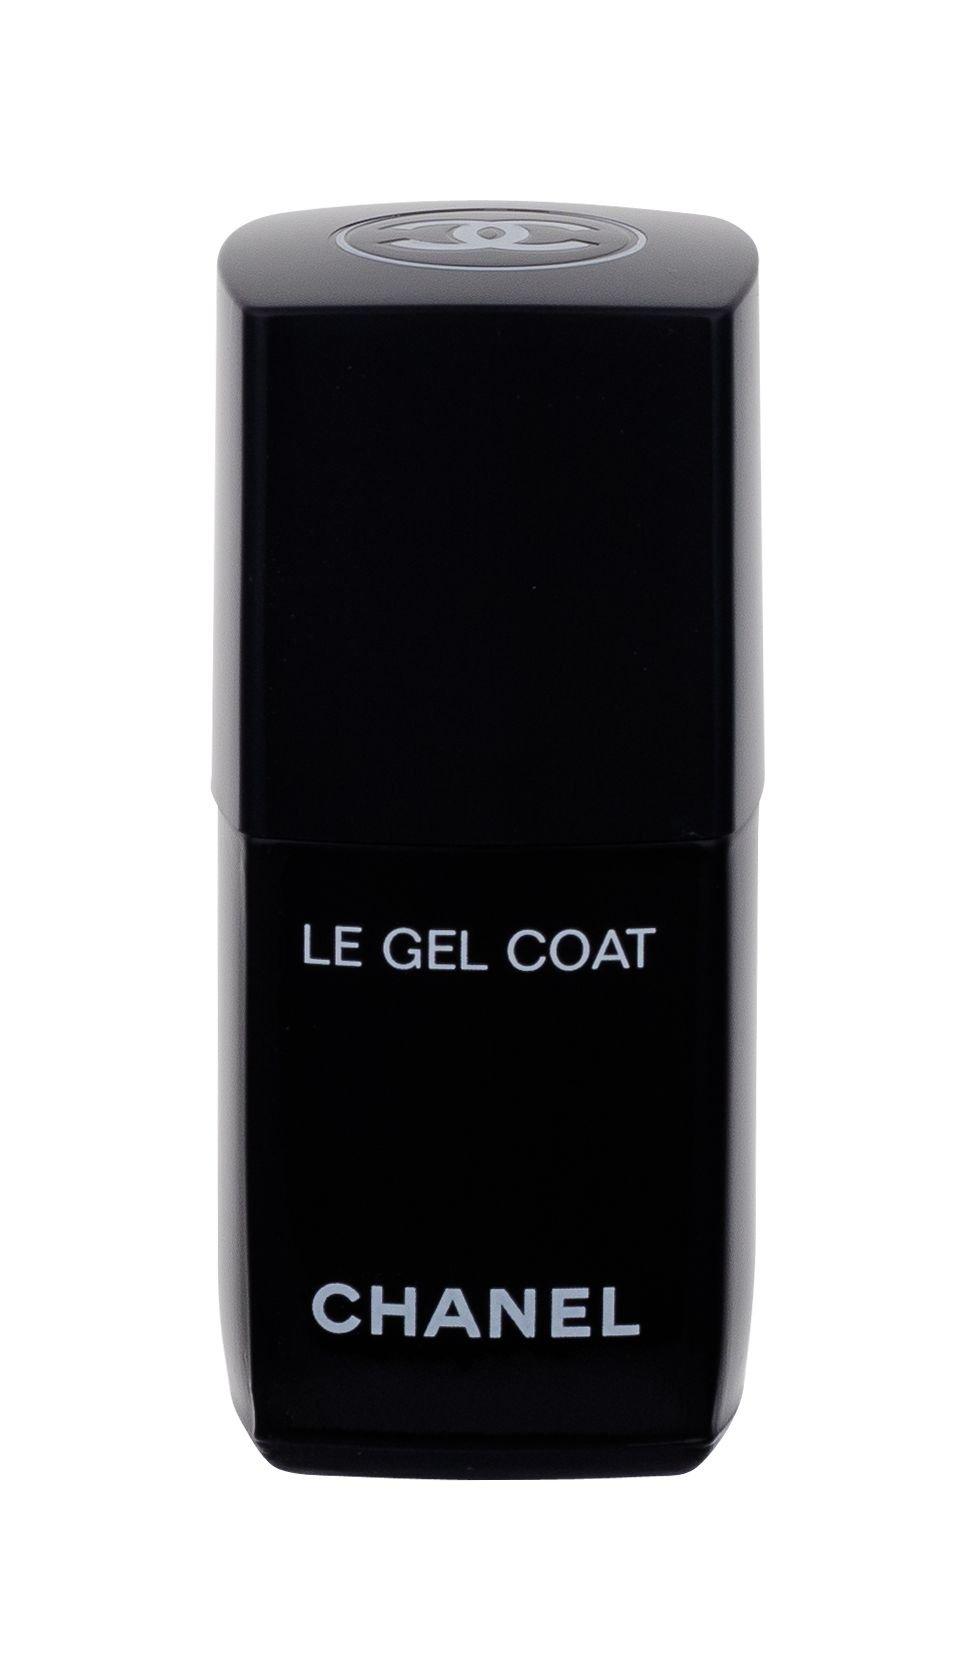 Chanel Le Gel Coat Nail Polish 13ml